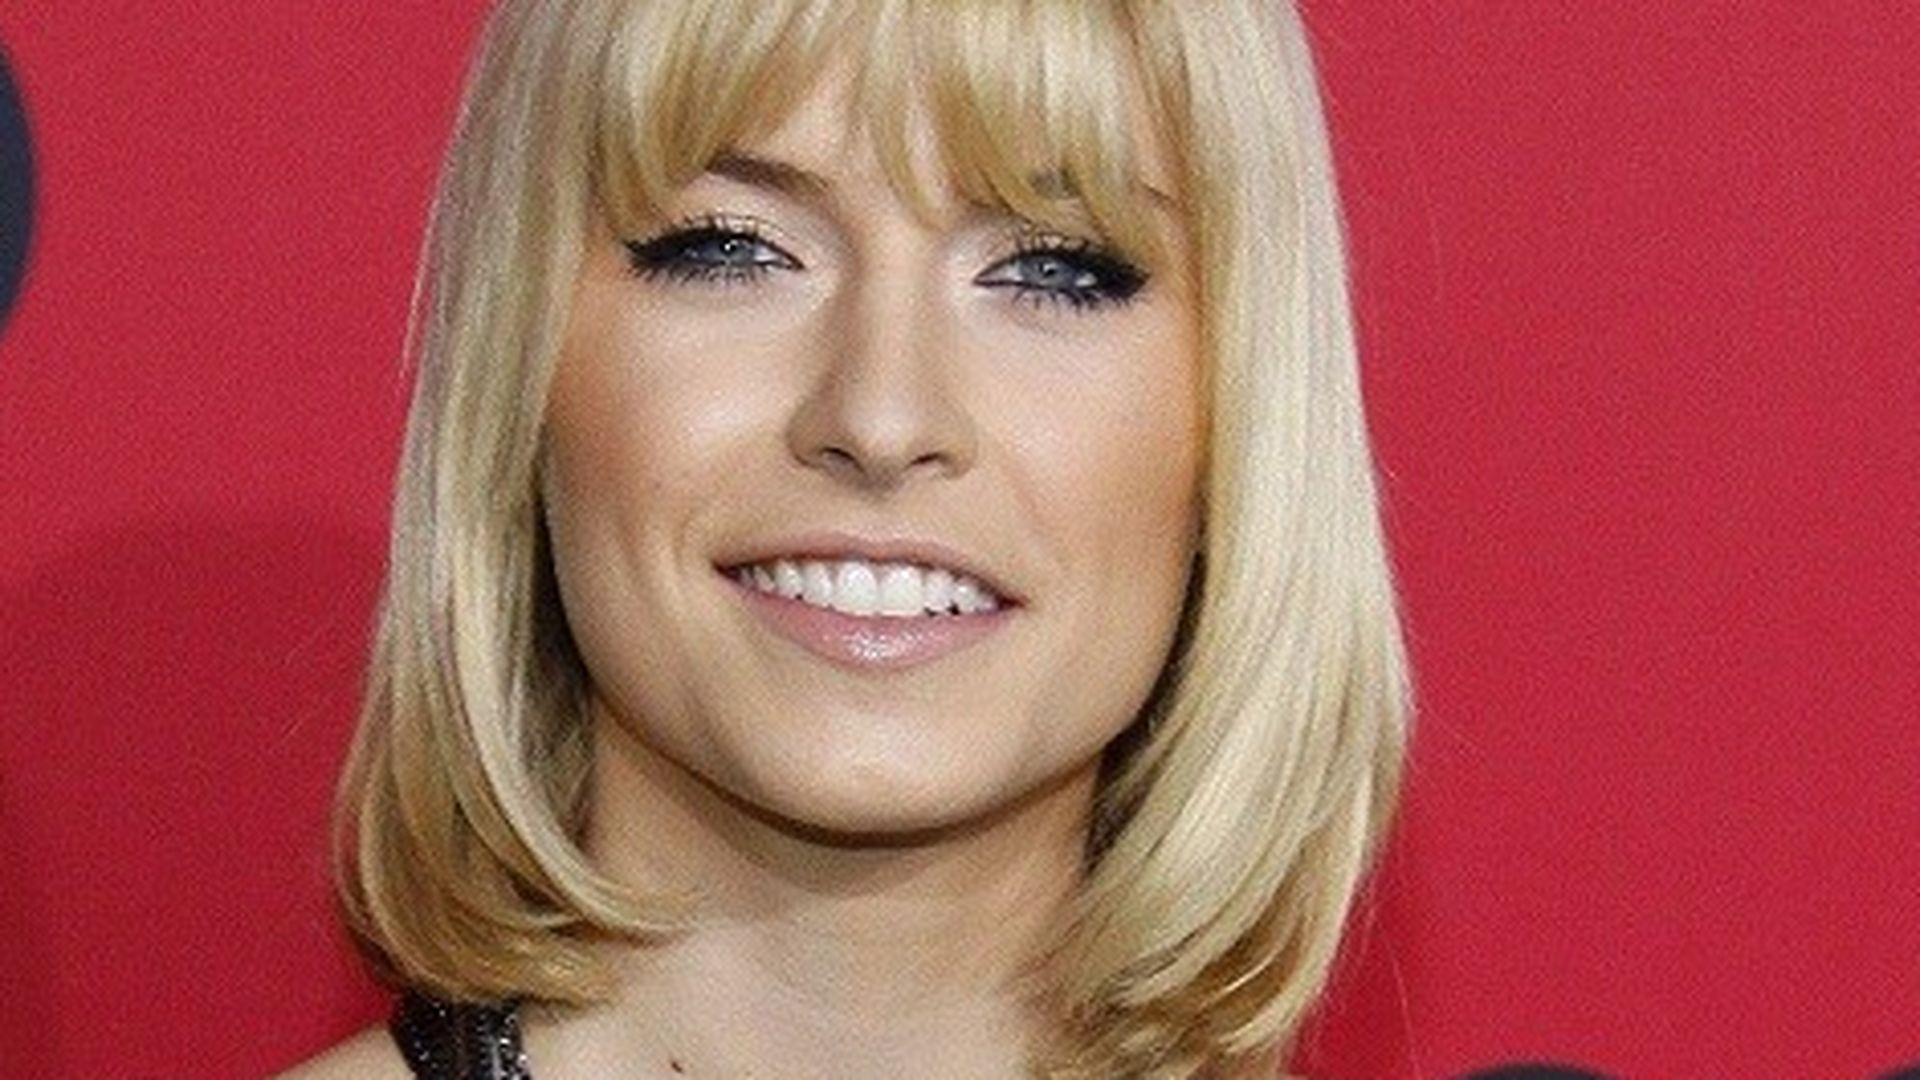 Neuer Look Lena Gercke hat ne neue Frisur